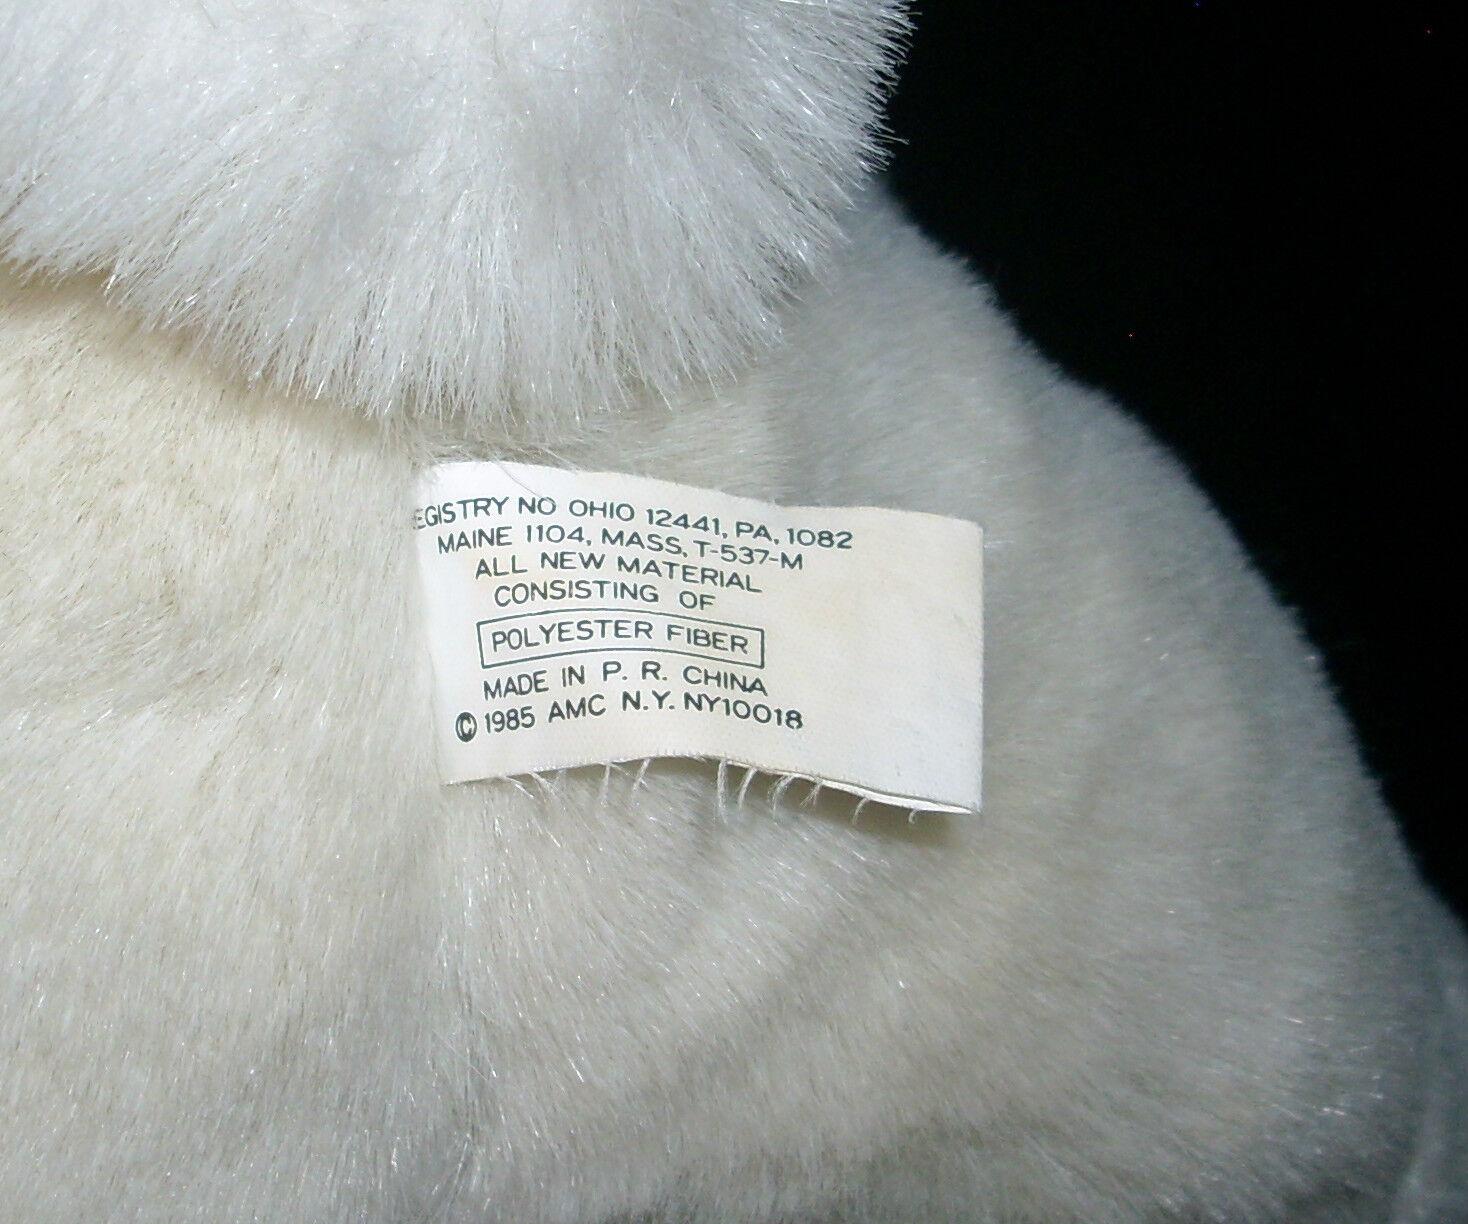 18 VINTAGE 1985 AMC Weiß EASTER BUNNY RABBIT STUFFED ANIMAL